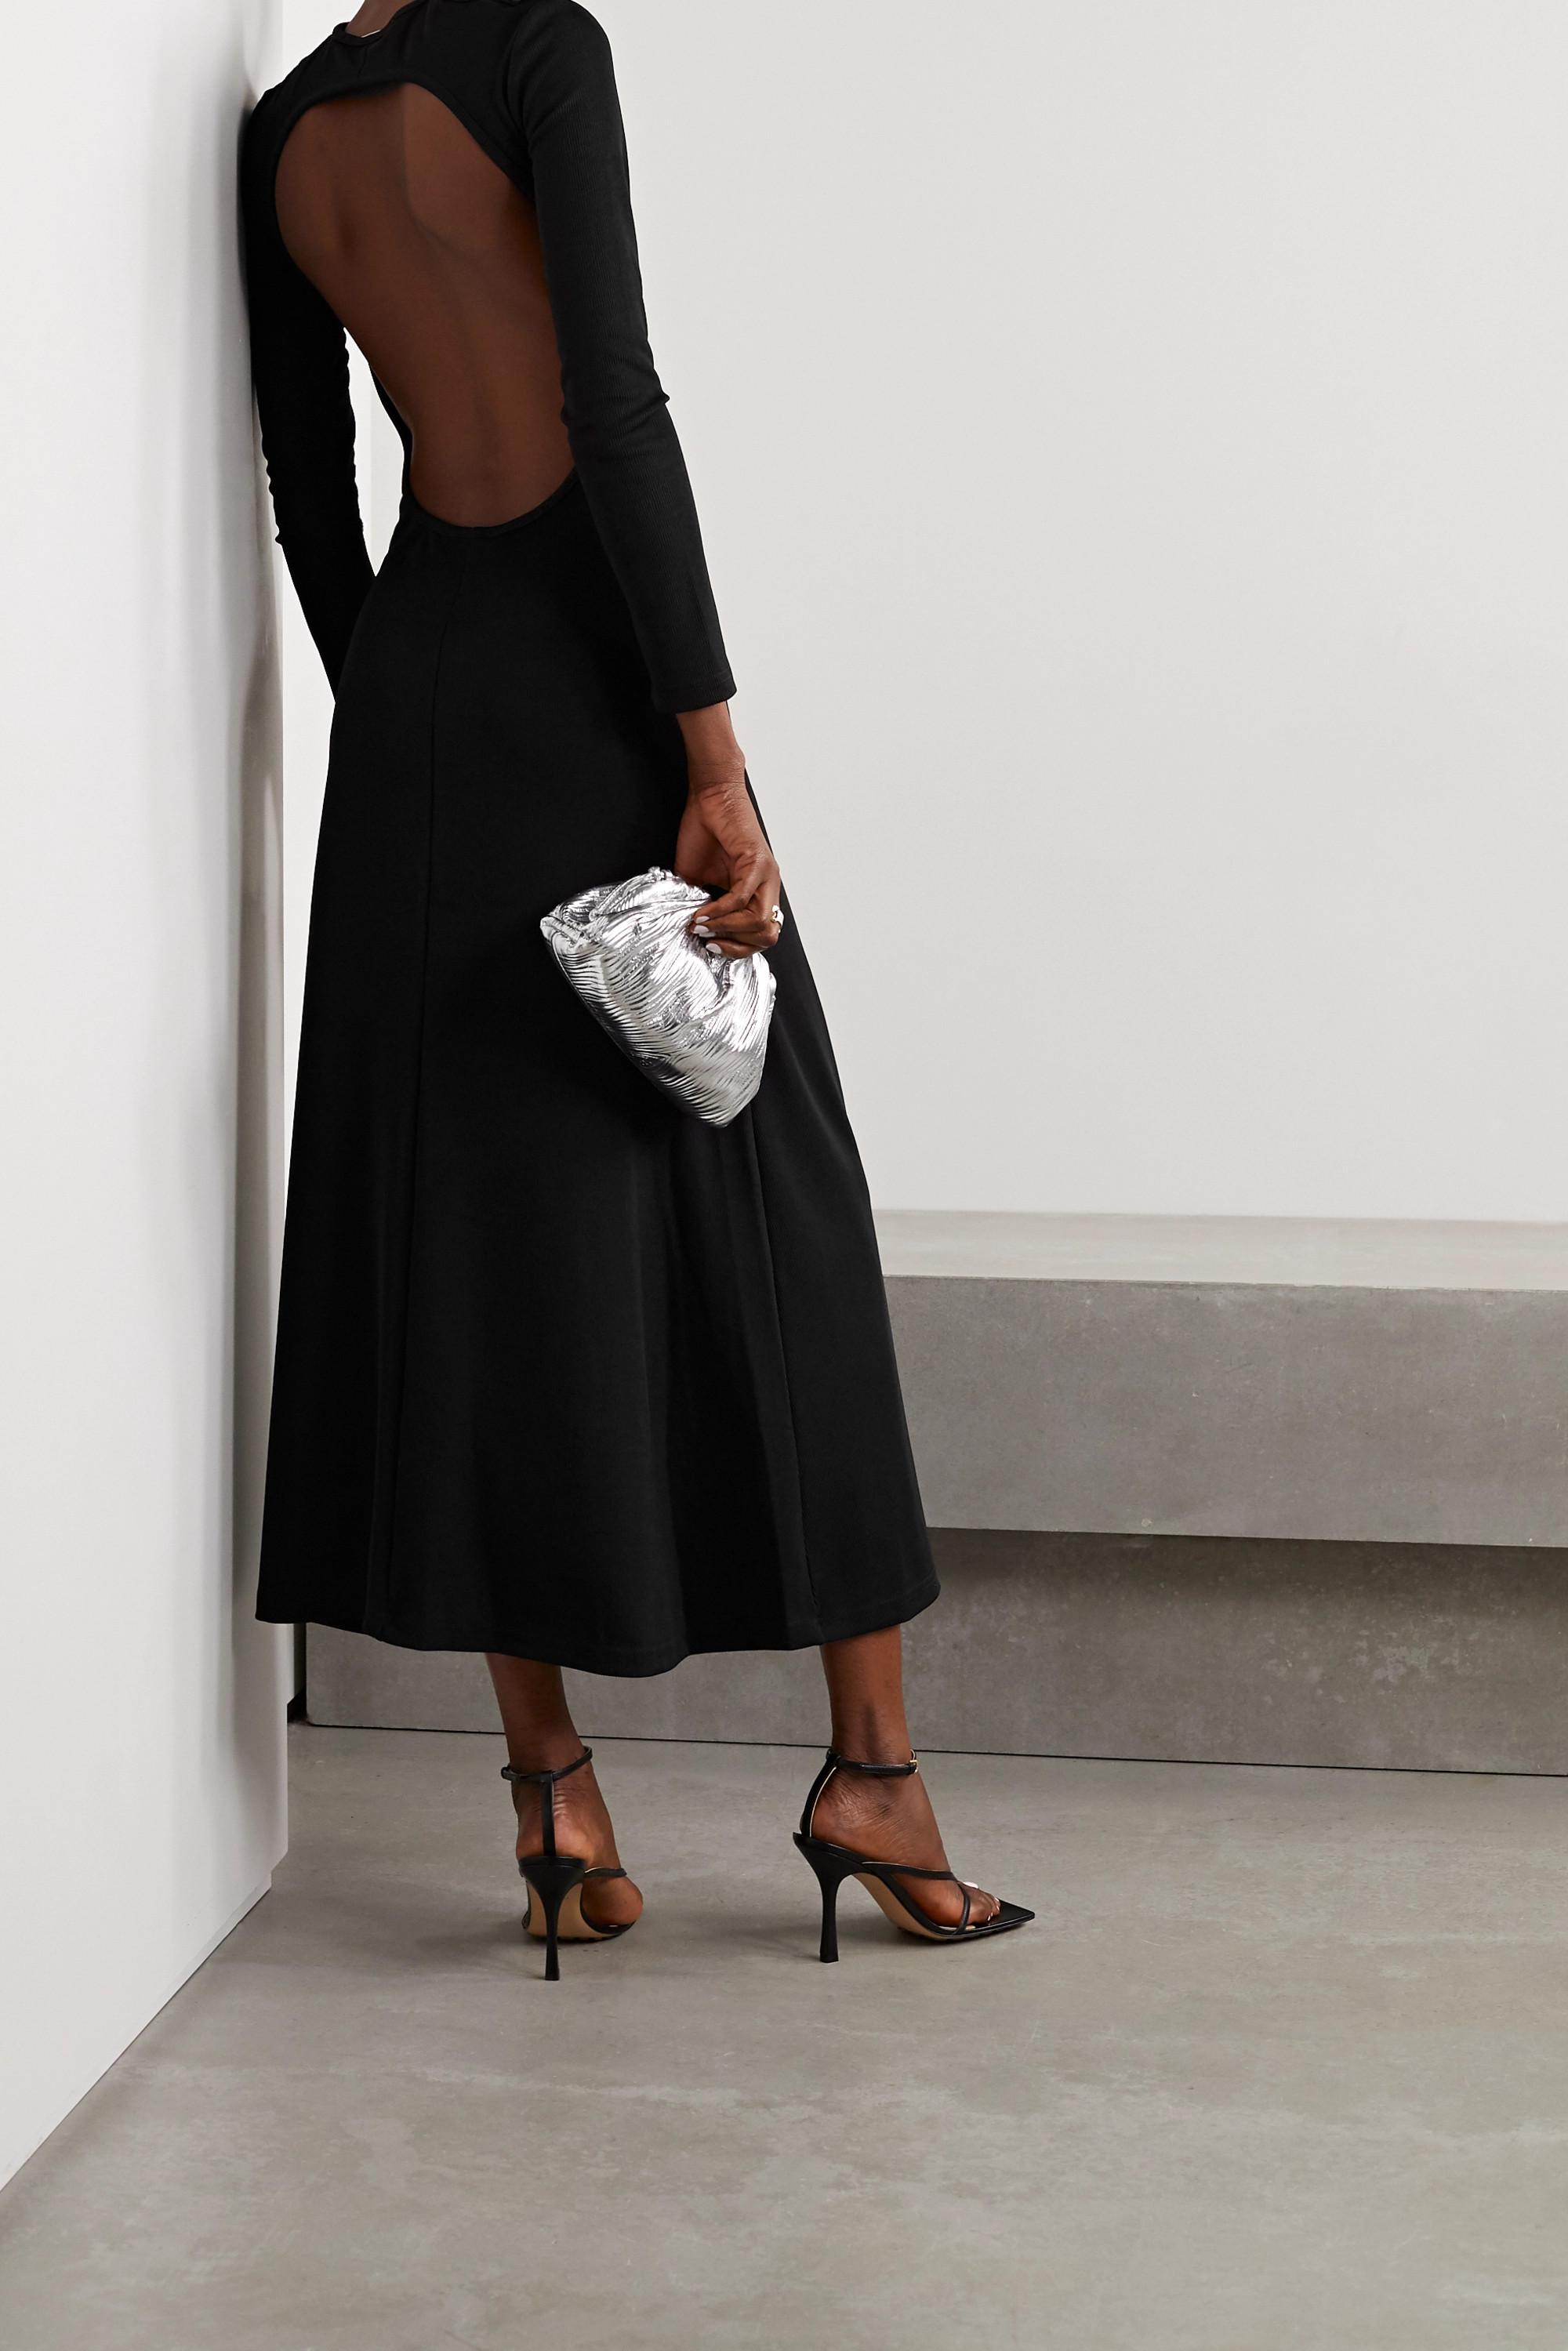 Fashion Forms Go Bare selbstklebender, trägerloser BH